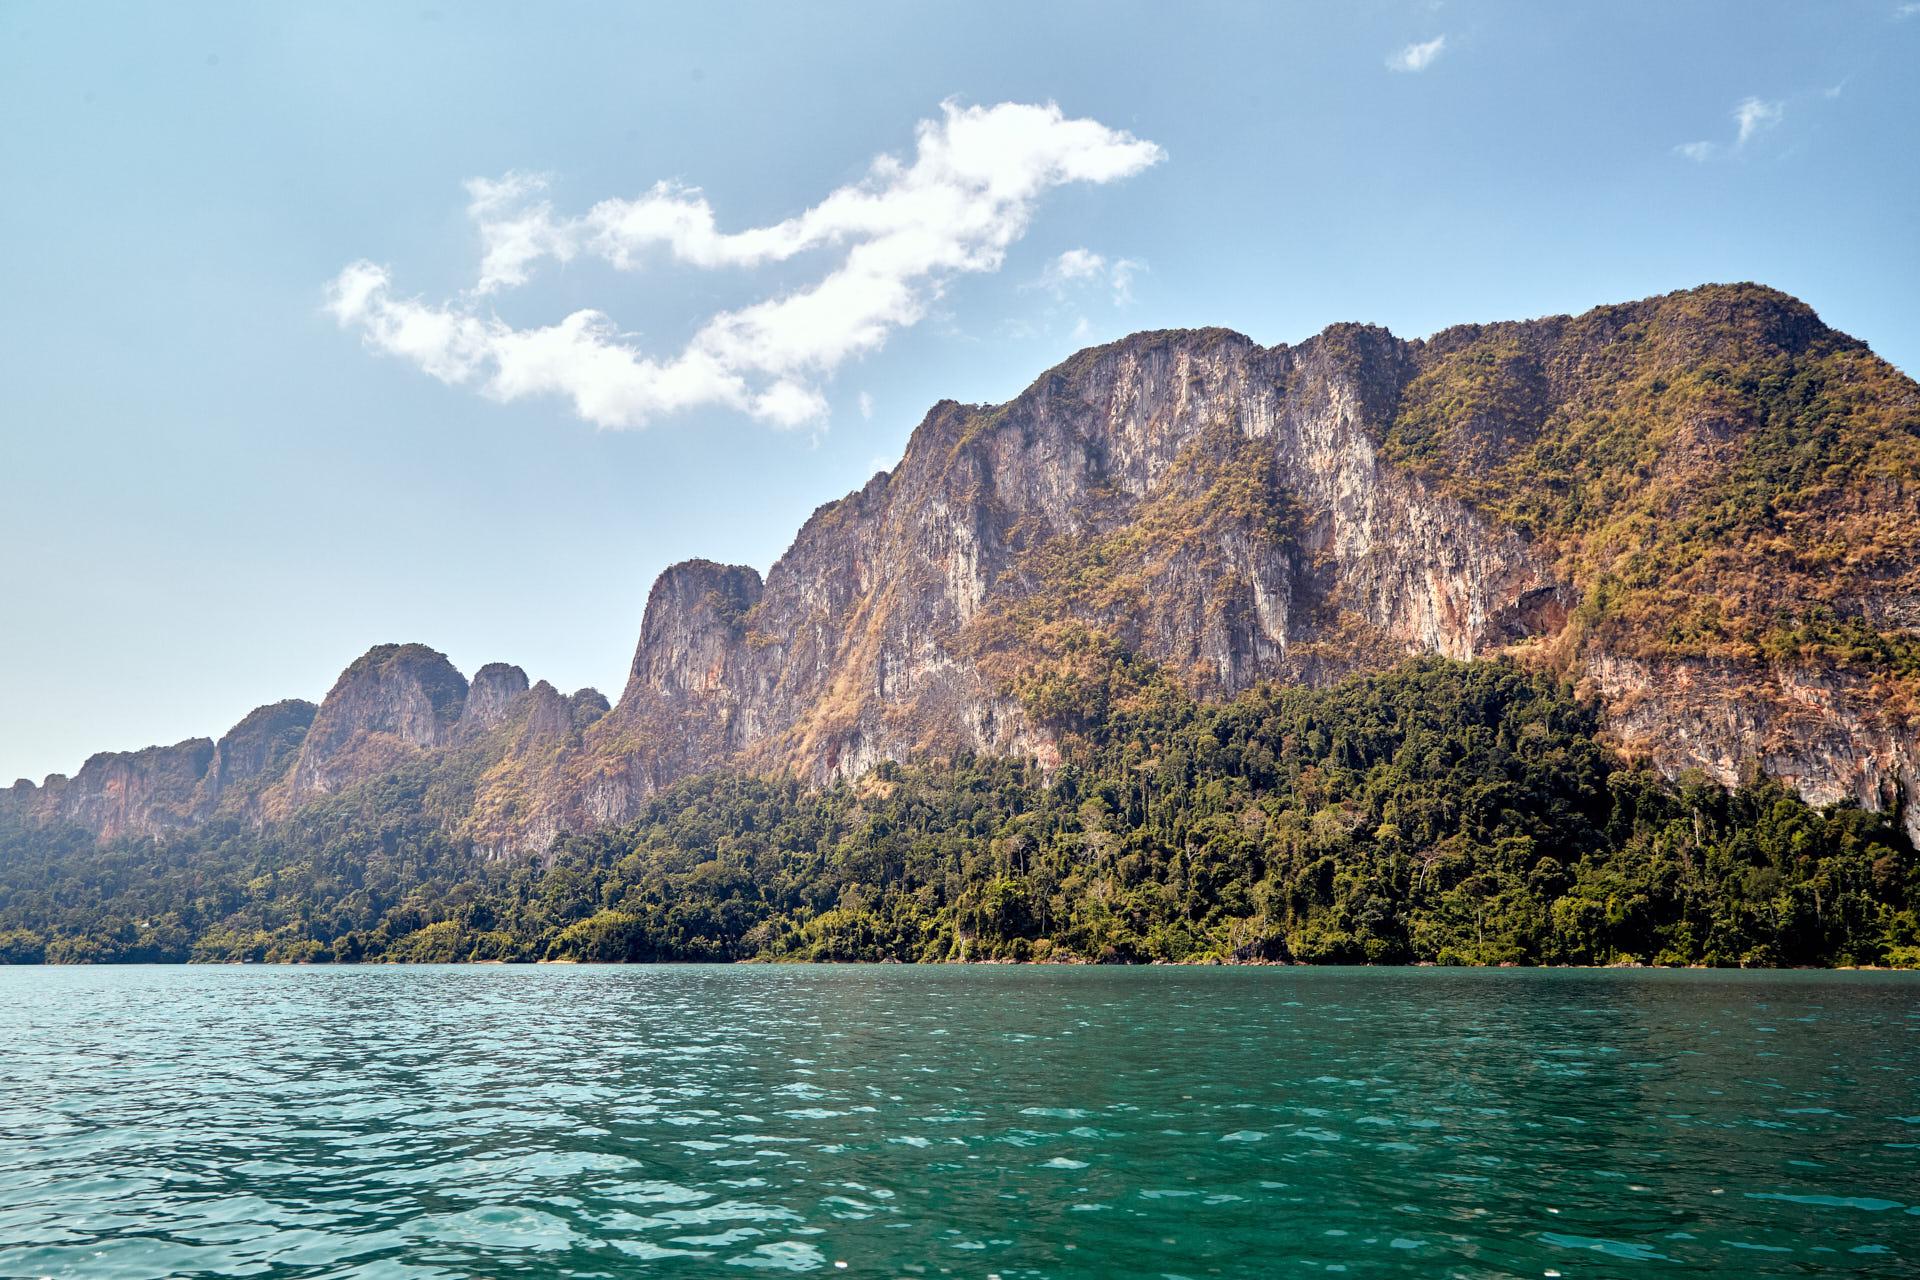 Les monts Karstiques de Khao Sok